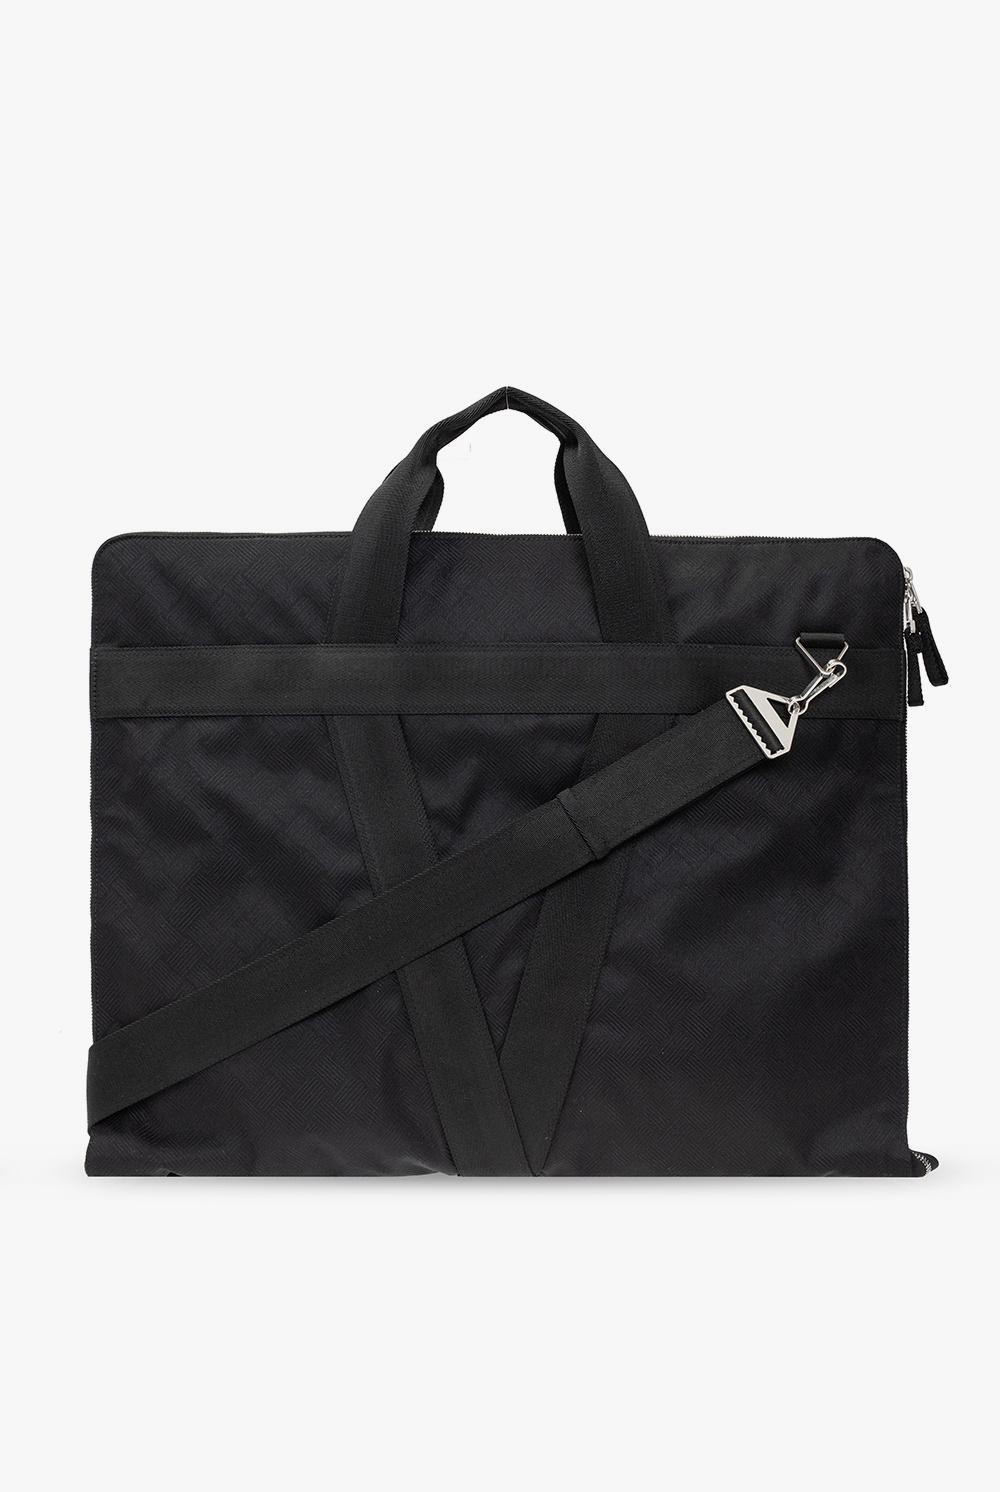 Bottega Veneta 西装保护套